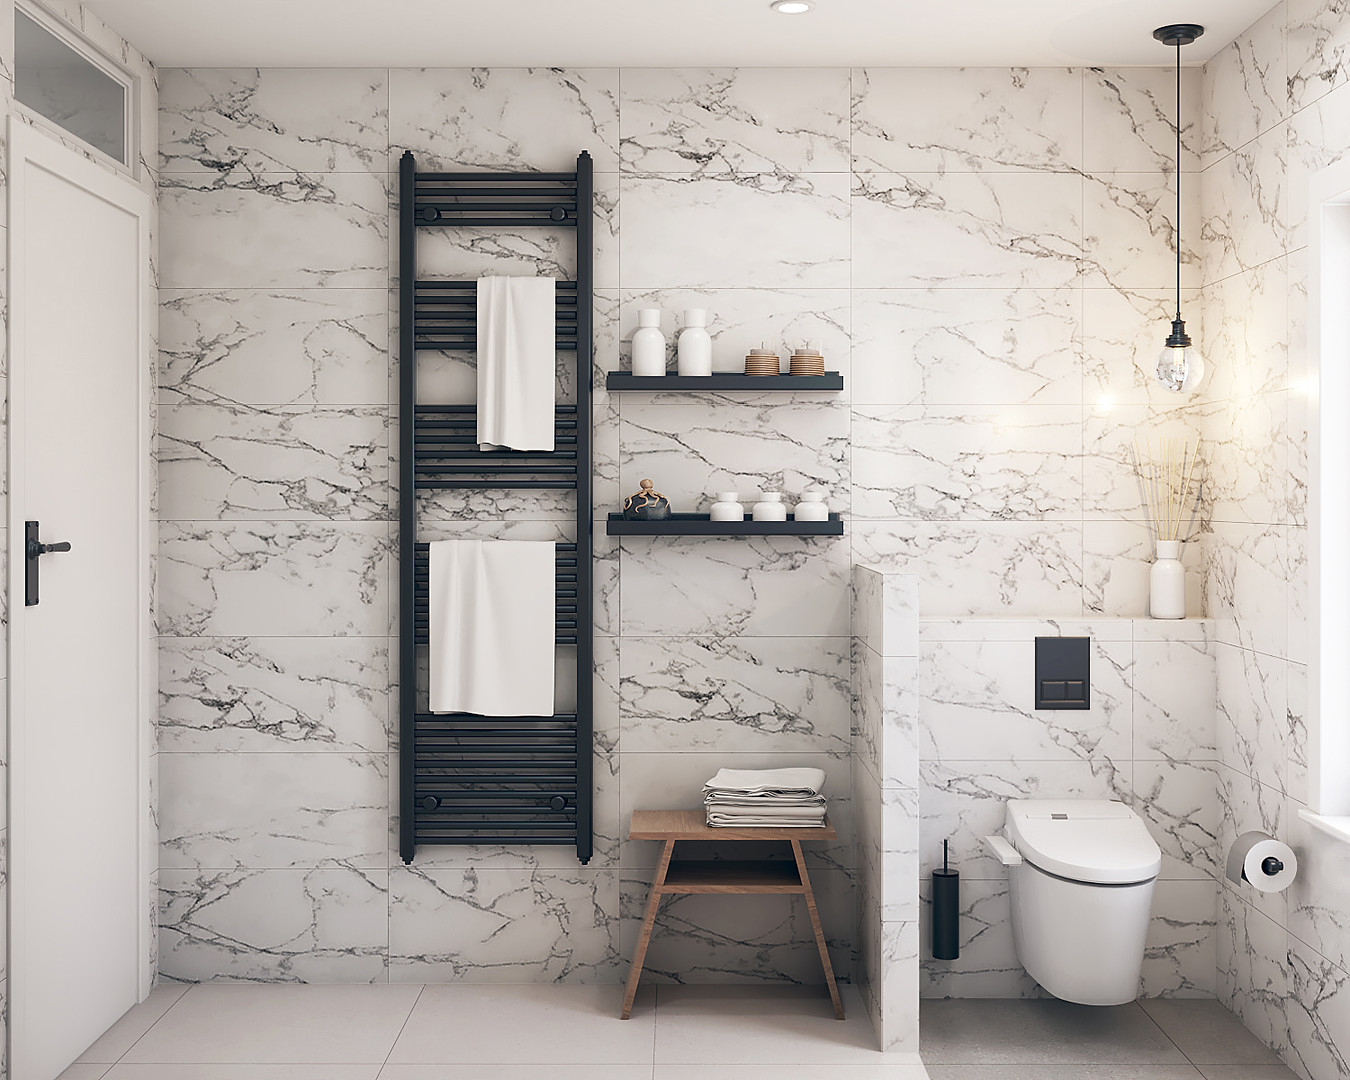 02_Main_bathroom_1A-2.jpg